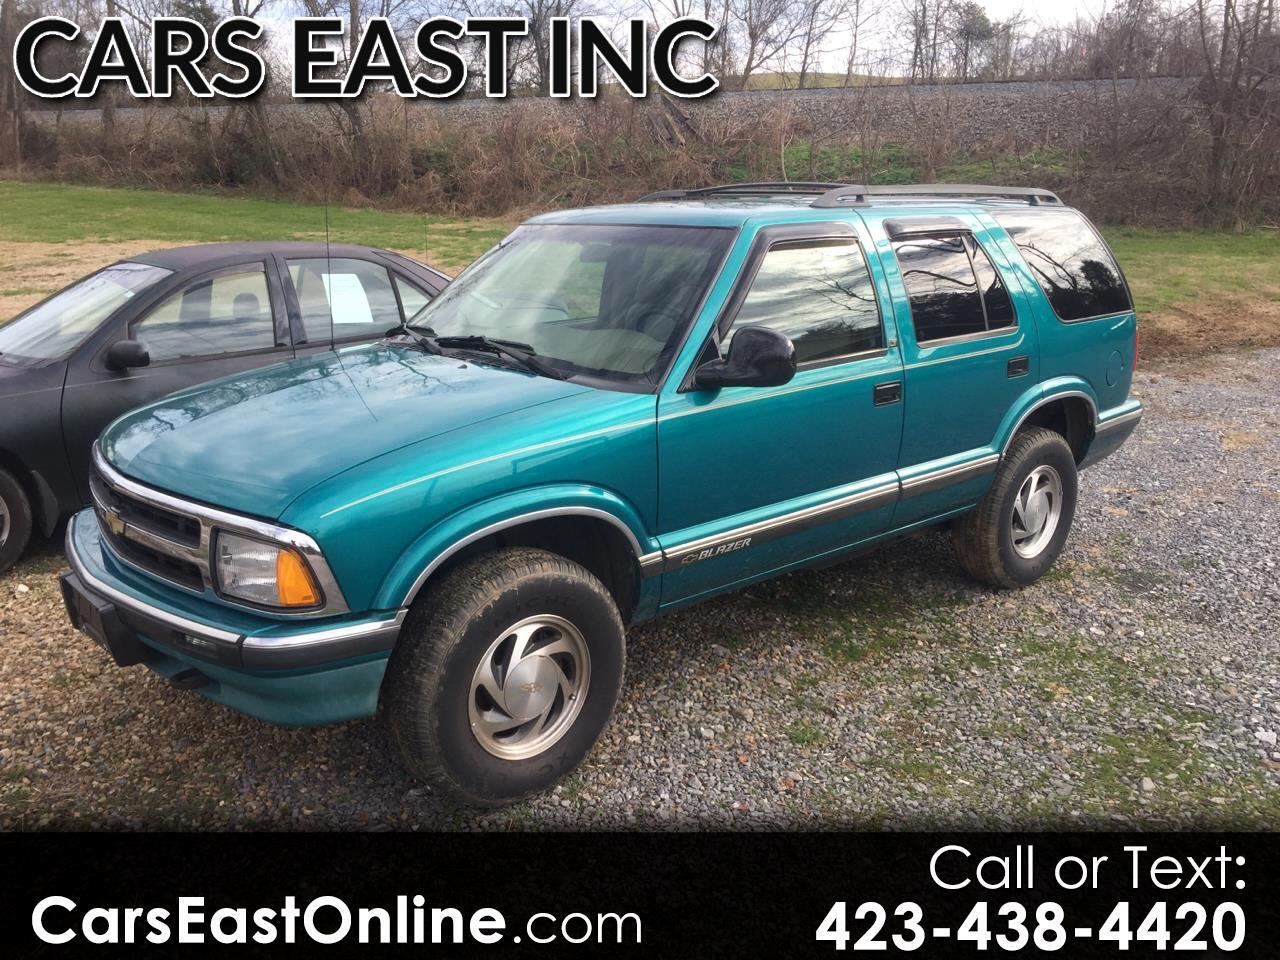 1995 Chevrolet Blazer 4dr 4WD